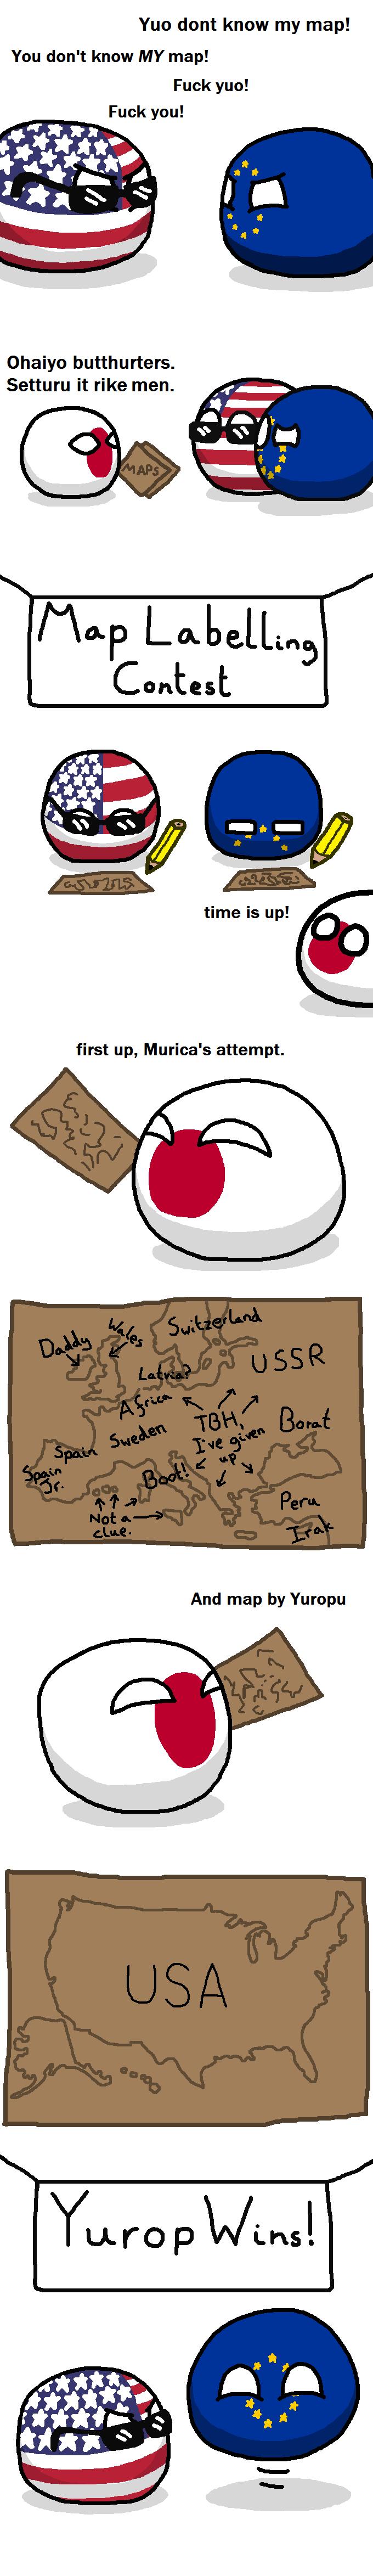 Polandball Comics Murricah+vs.+Yurope+Map+Skills.+credit+to+polandball+i+m+not+responsible_bd9ca5_4913744